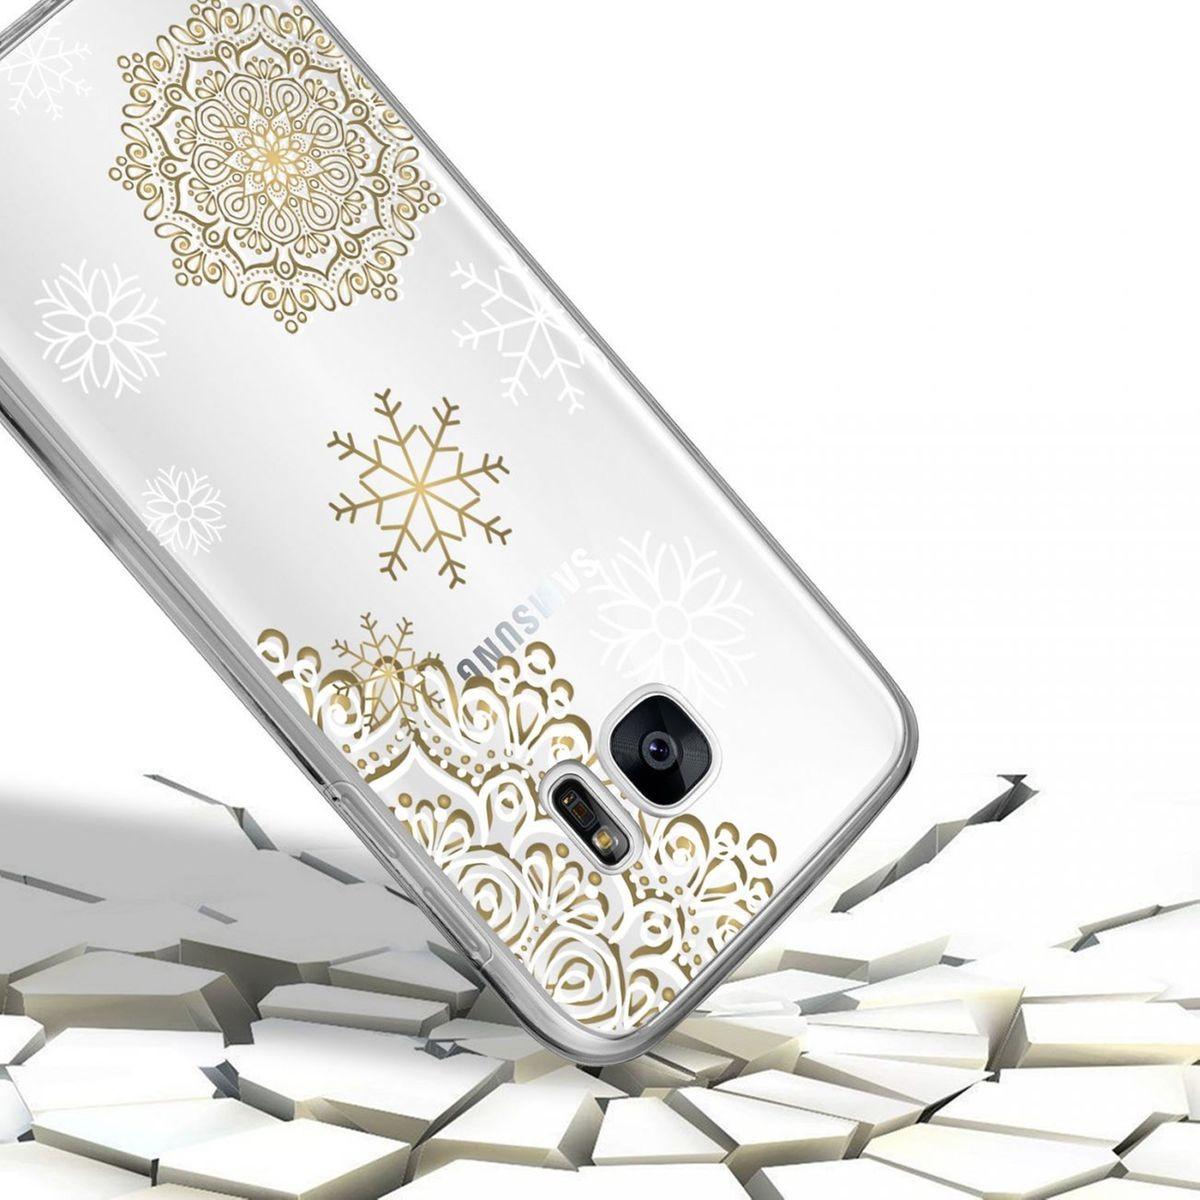 2e9fd34631e0f9 Coque Samsung Galaxy S7 Edge 360 Intégrale Transparente, Flocon Mandala,  Evetane® - Taille